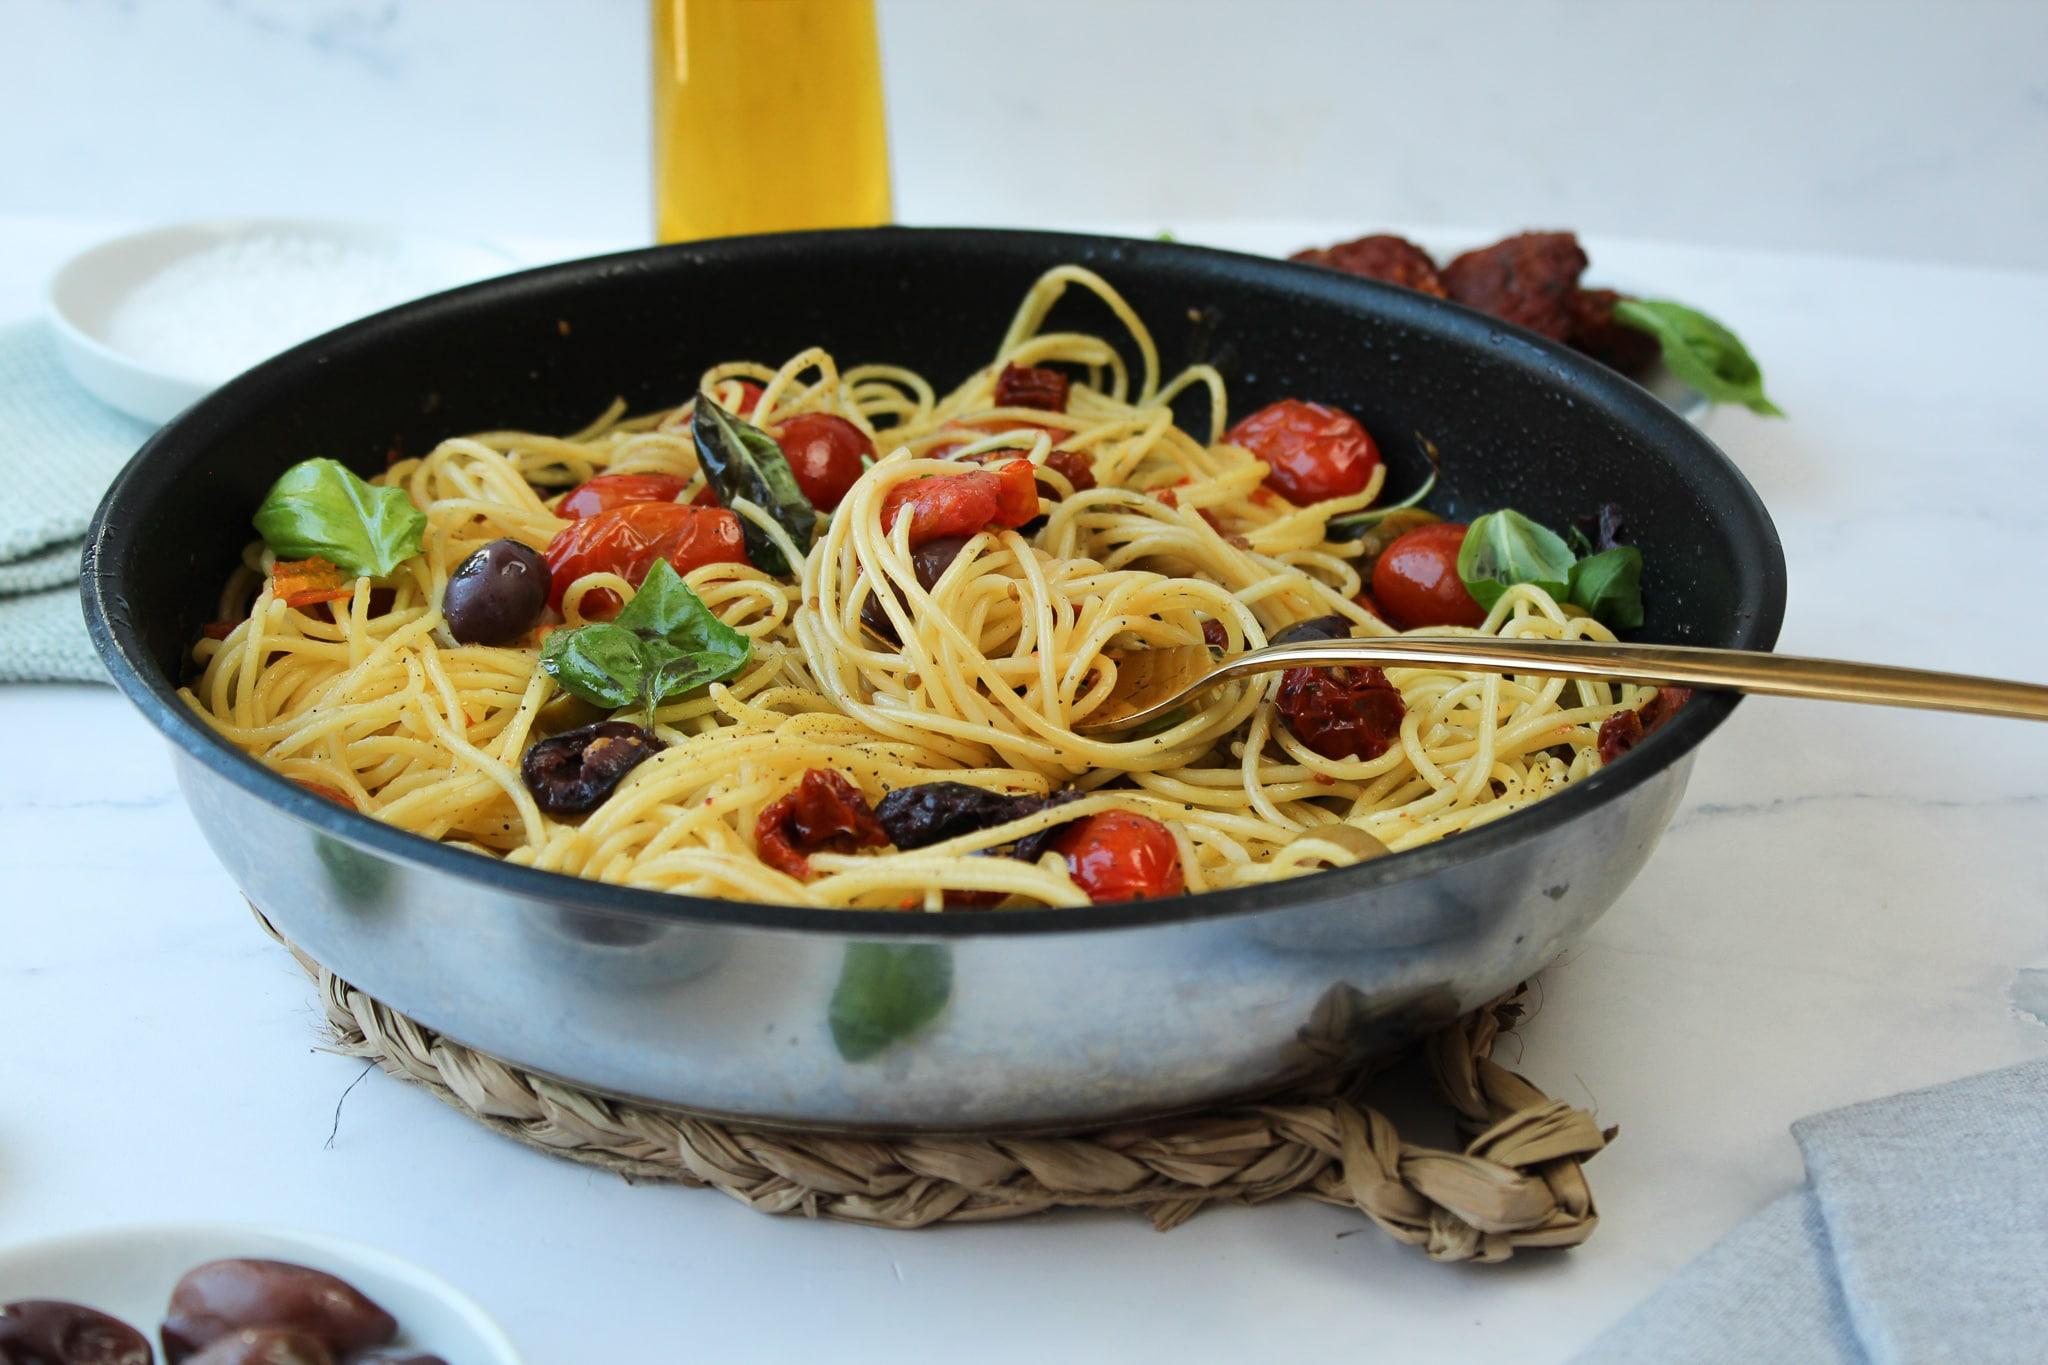 Spaghetti mit Olivenöl, Tomaten und Oliven